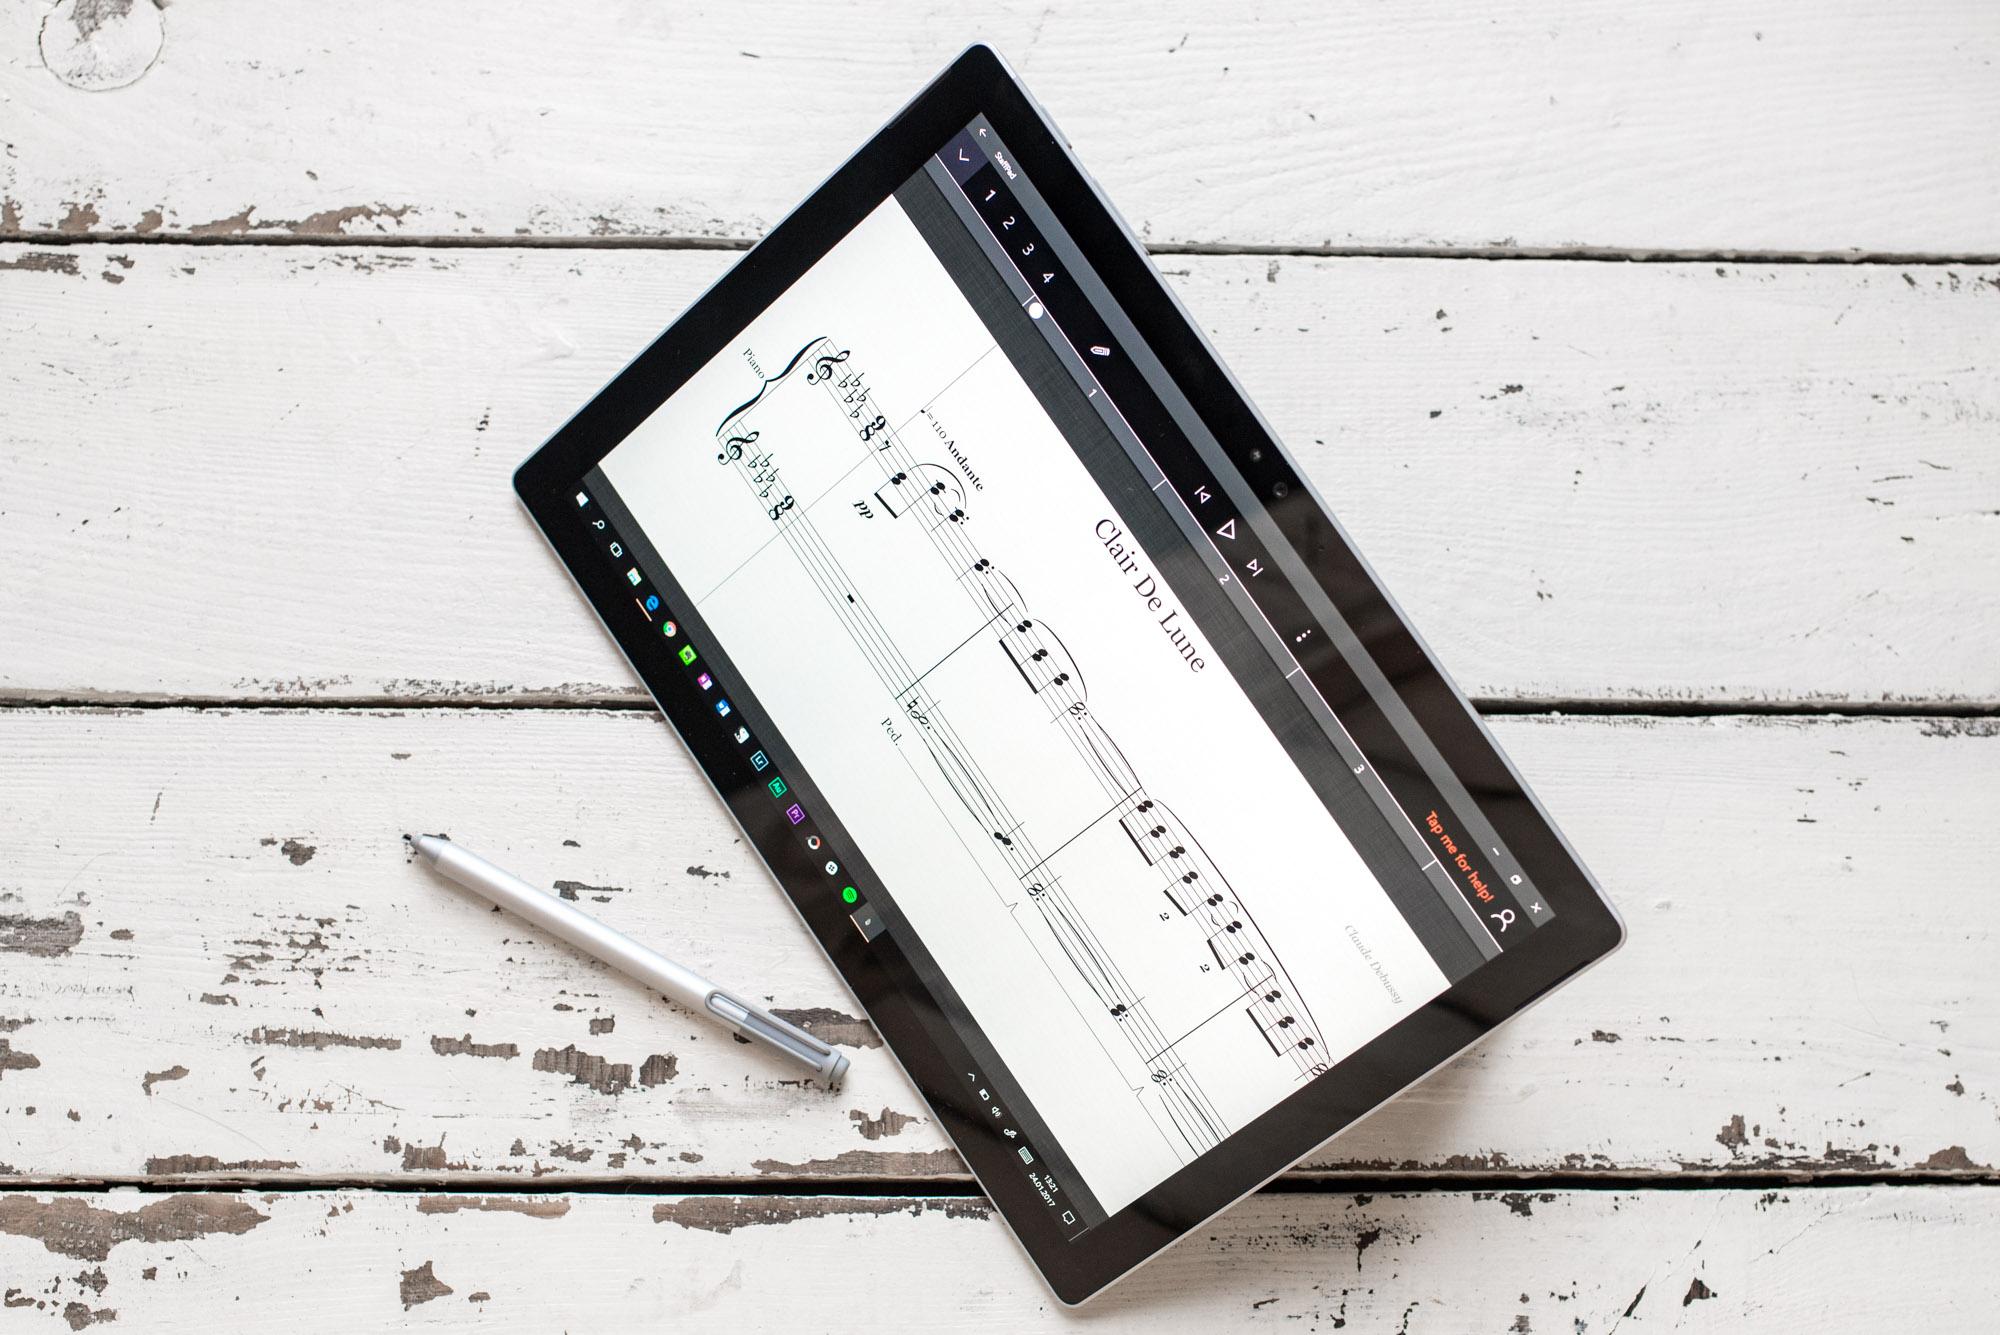 Surface-Pro-4-LK-10